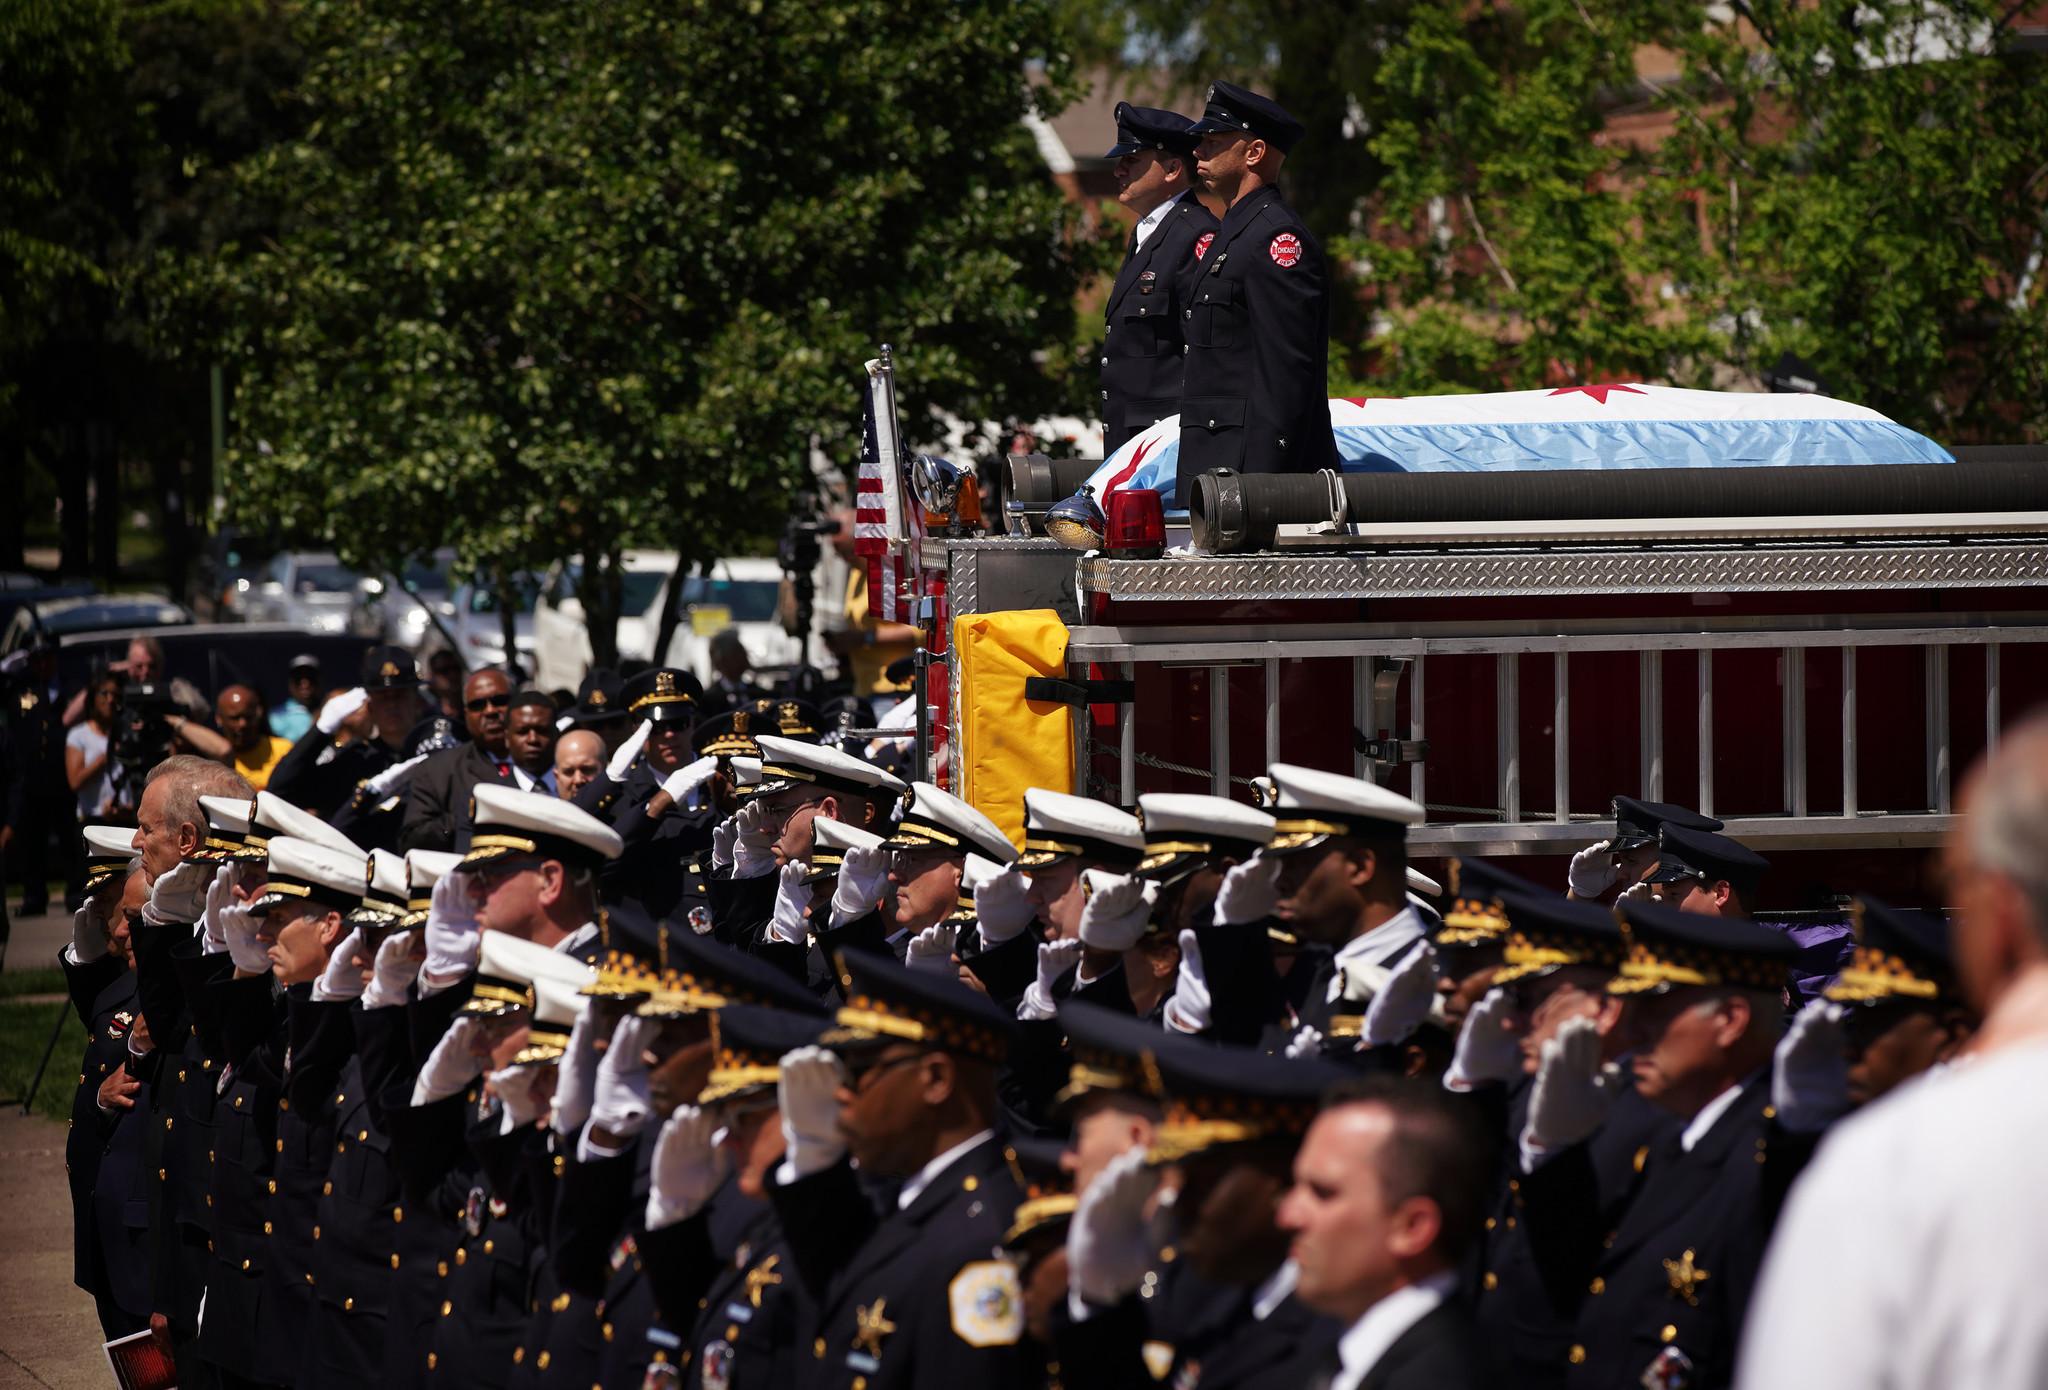 Ct-juan-bucio-chicago-diver-funeral-visitation-photos-20180603